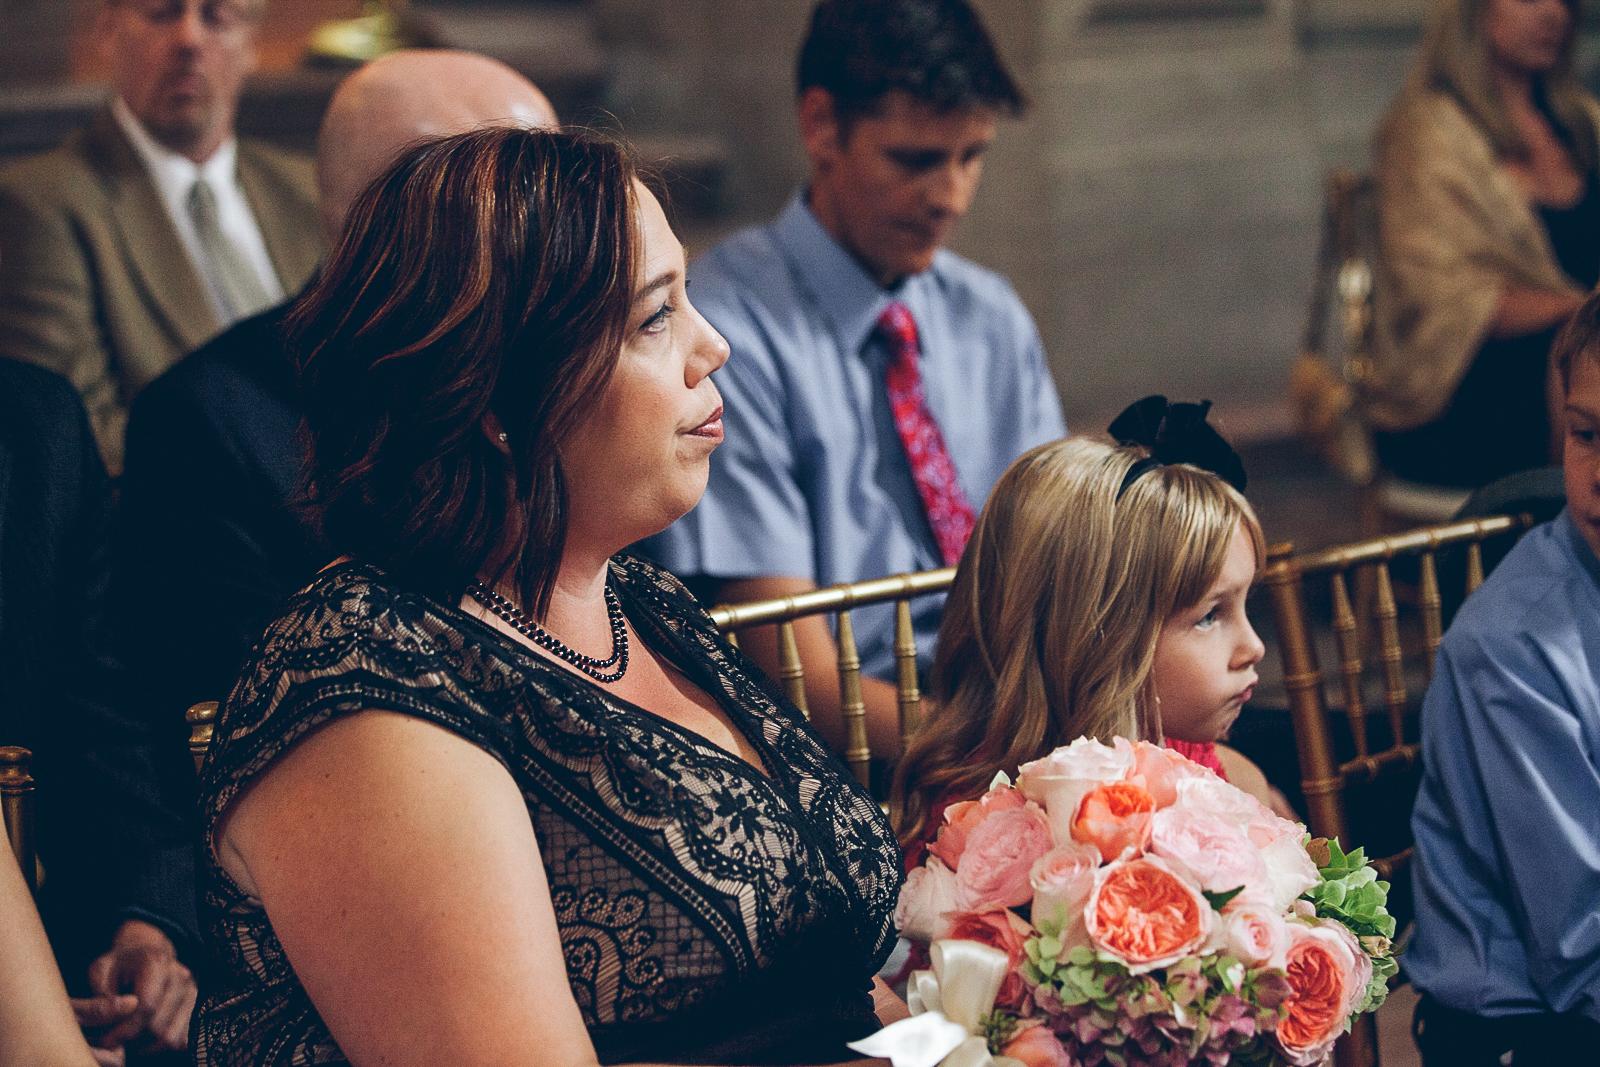 San_francisco_city_hall_wedding_photography_meegan_travis_ebony_siovhan_bokeh_photography_16.jpg